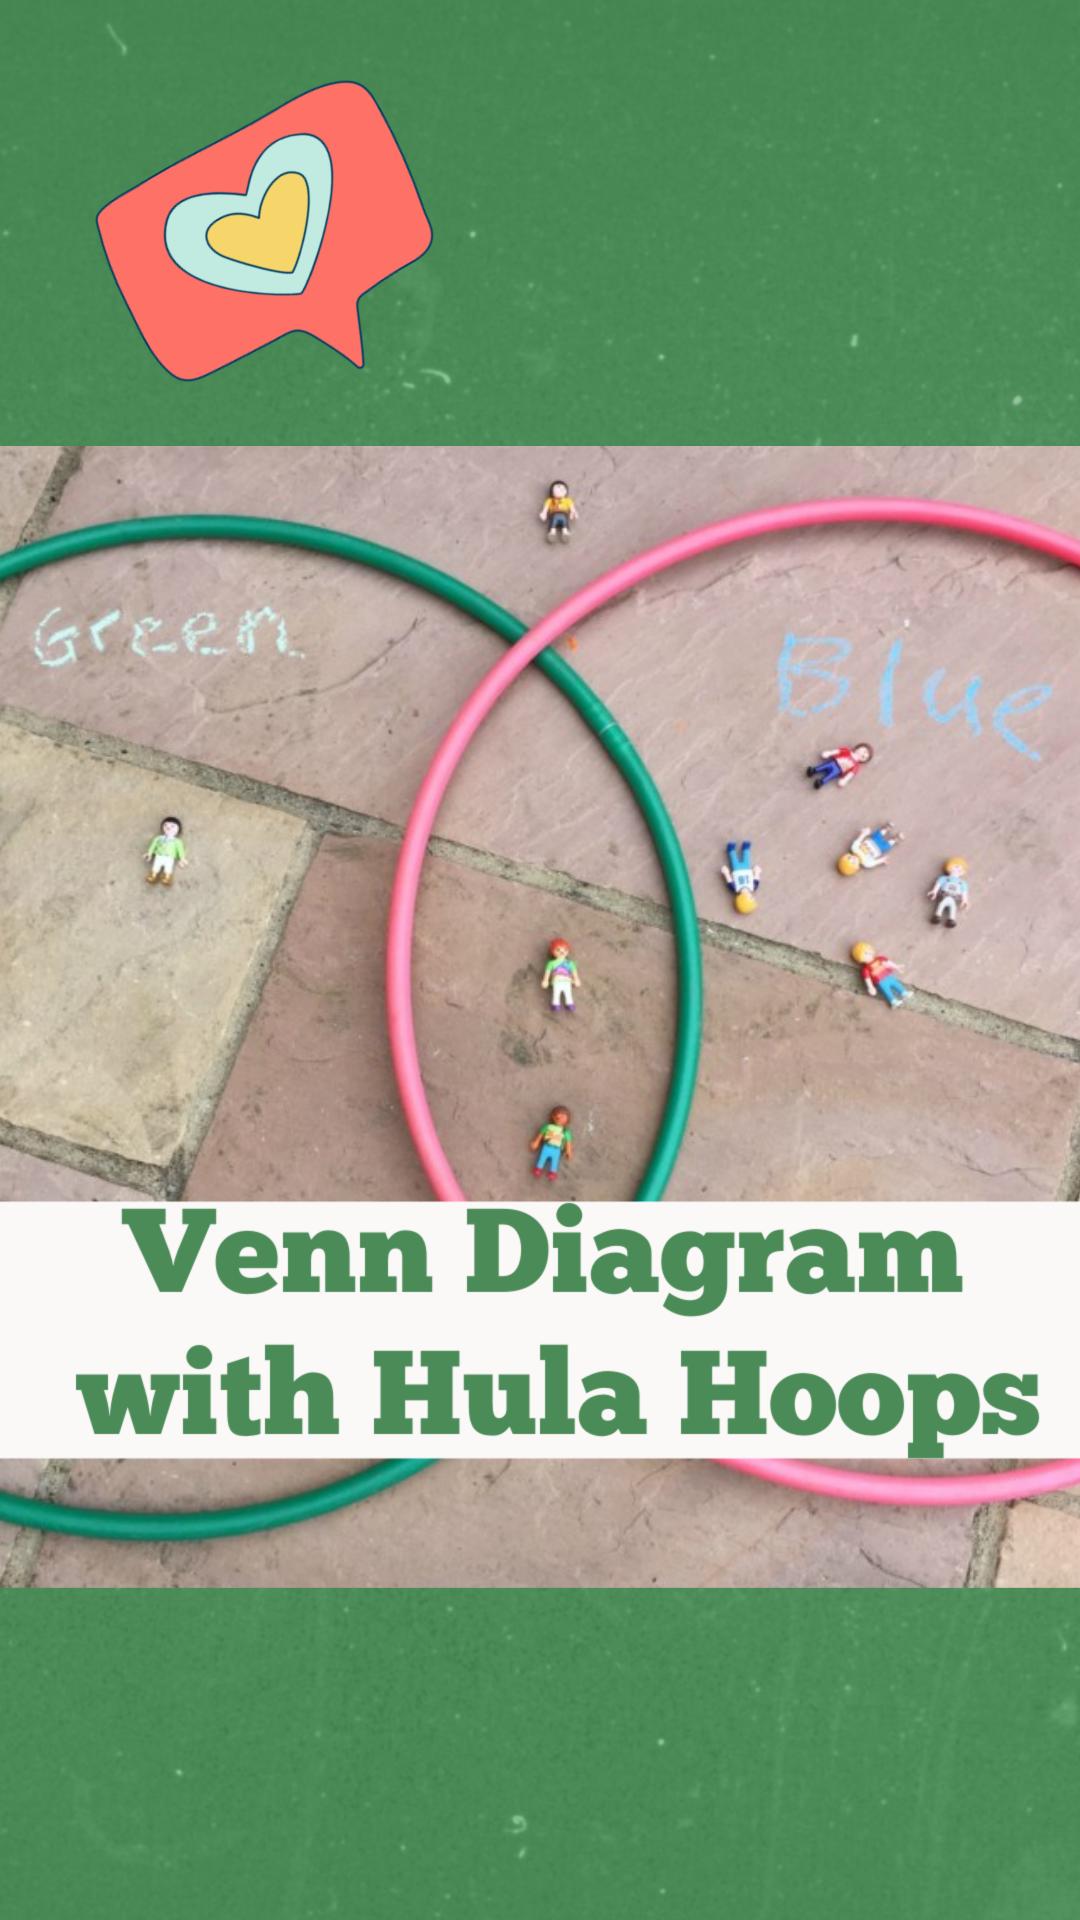 How To Make A Venn Diagram With Hula Hoops